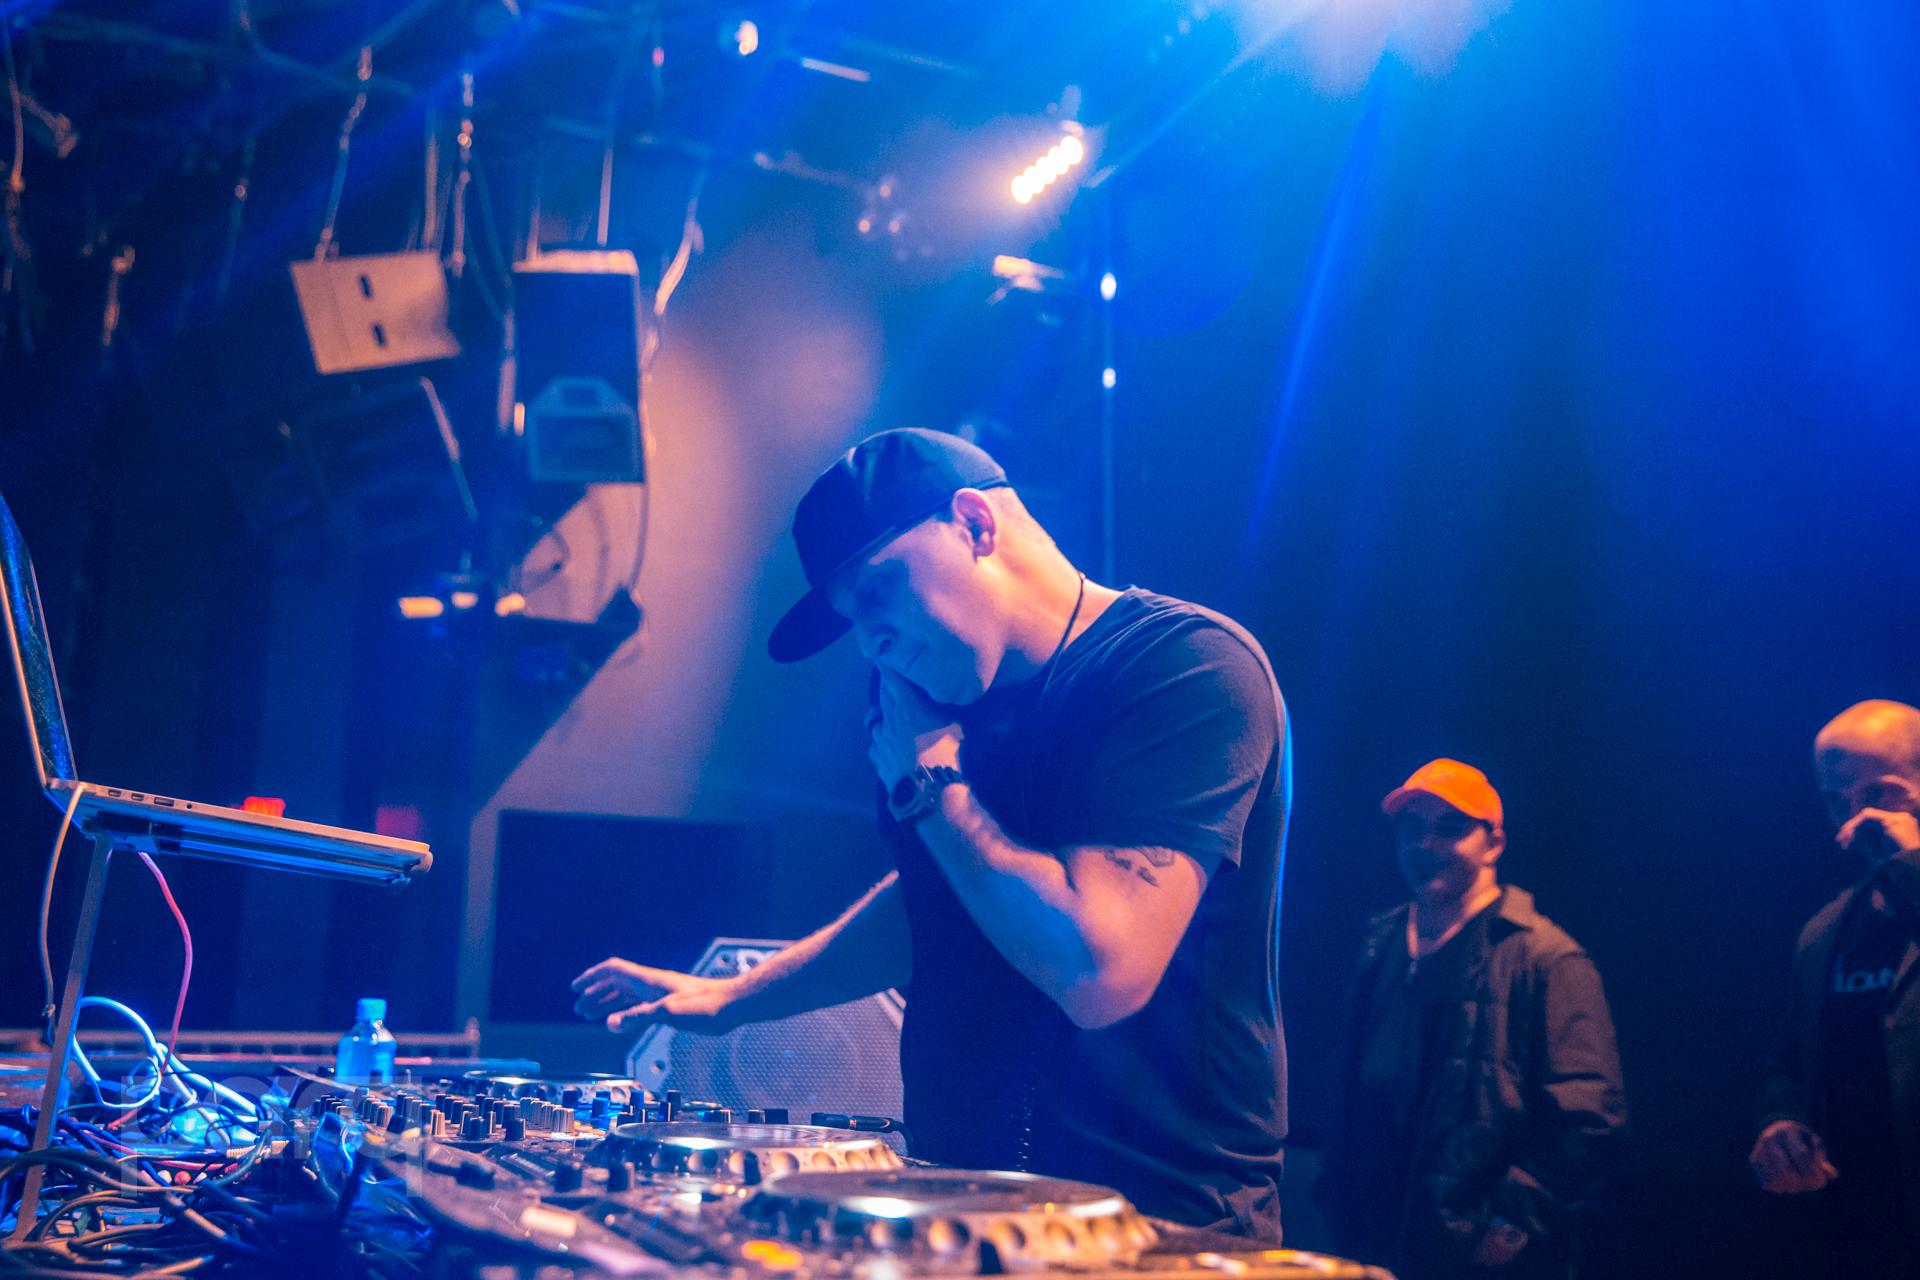 01.19.18 Parq - DJ Hollywood-16.jpg